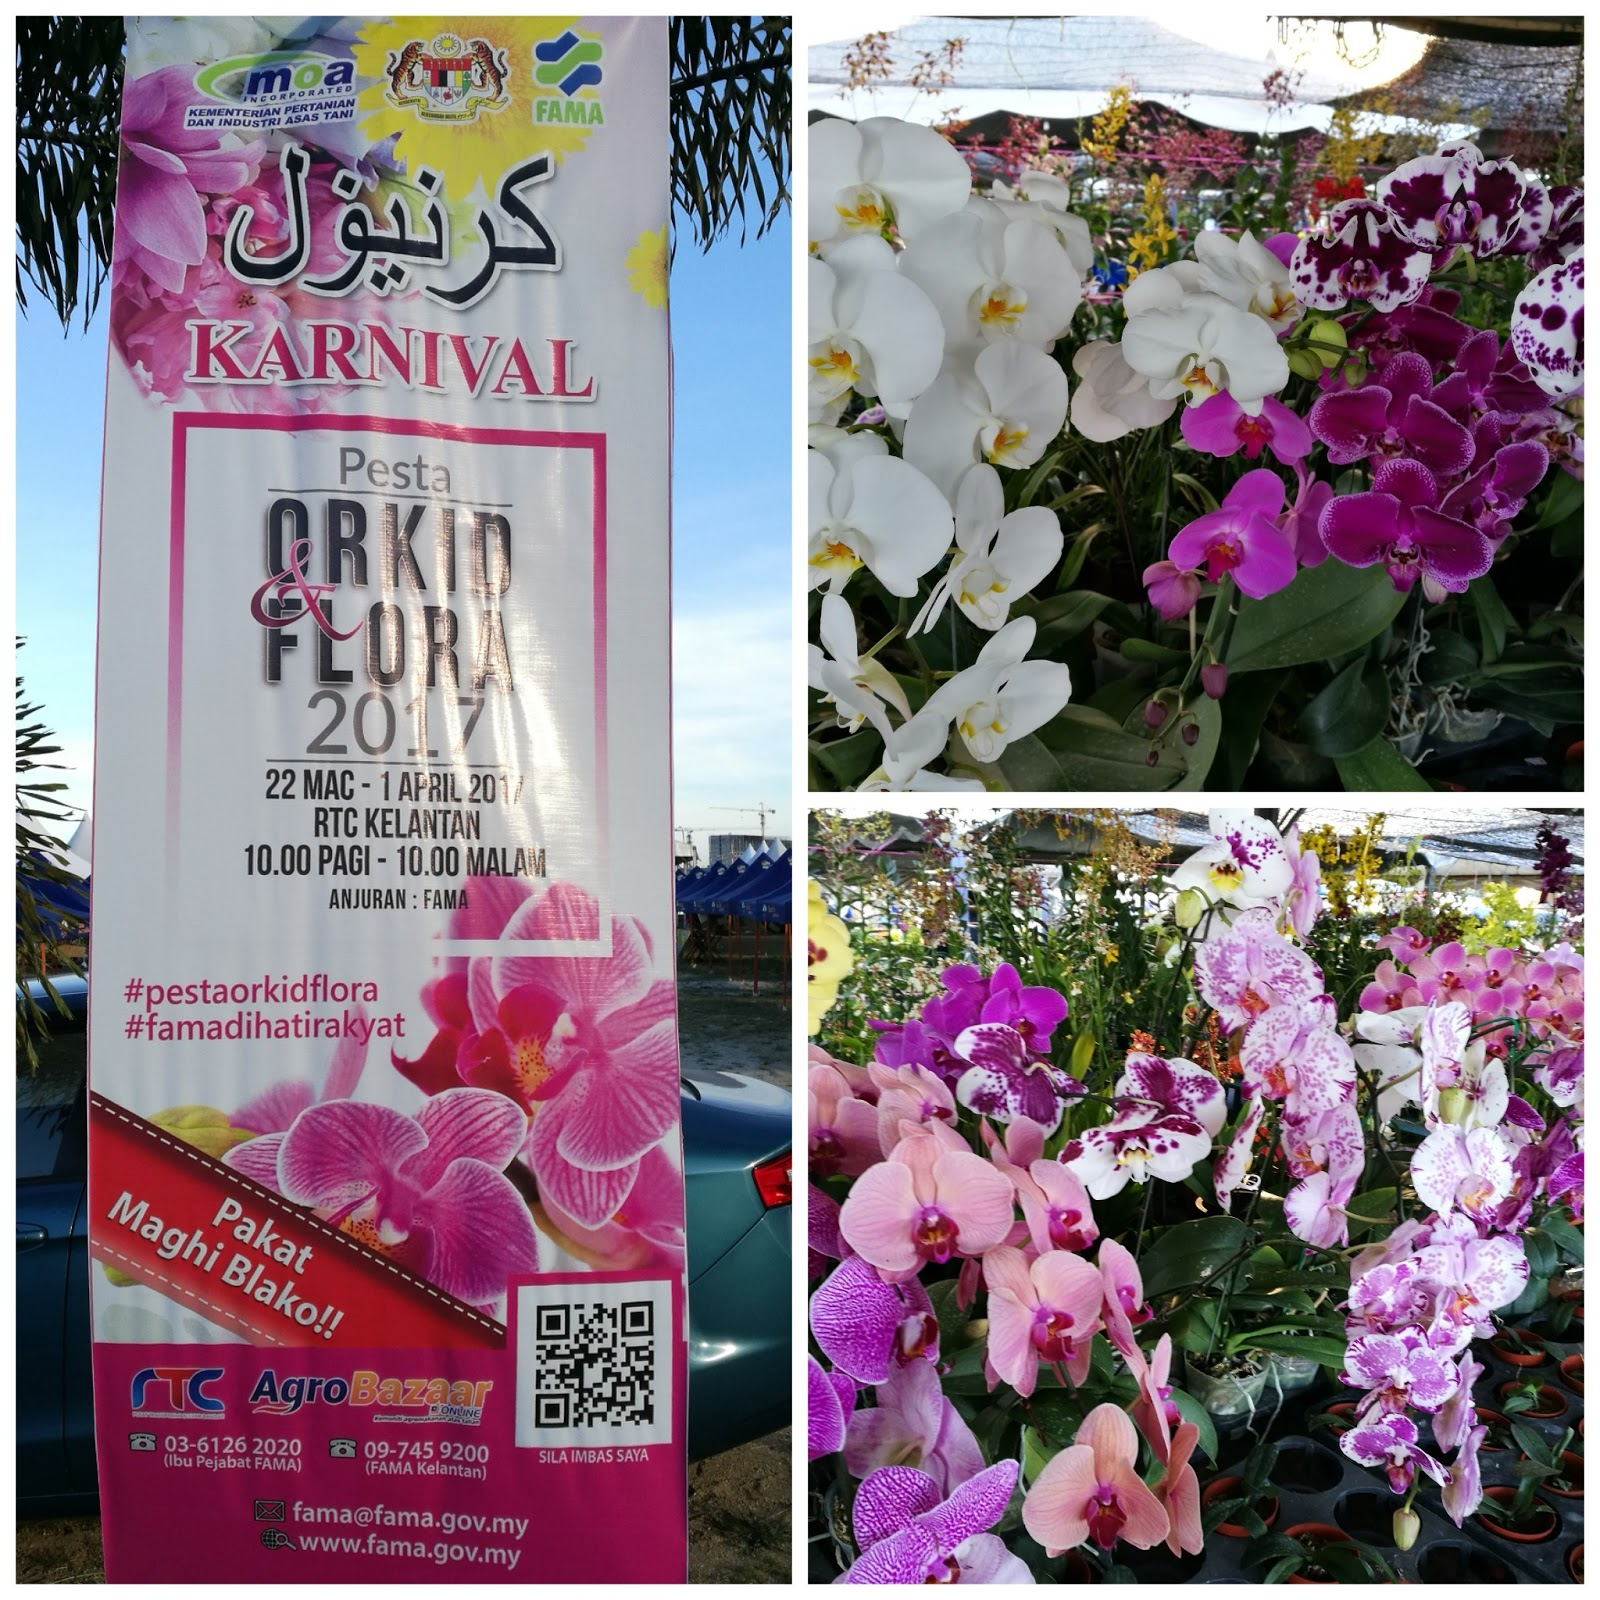 Kembara Minda 7 Pesta Orkid Flora 2017